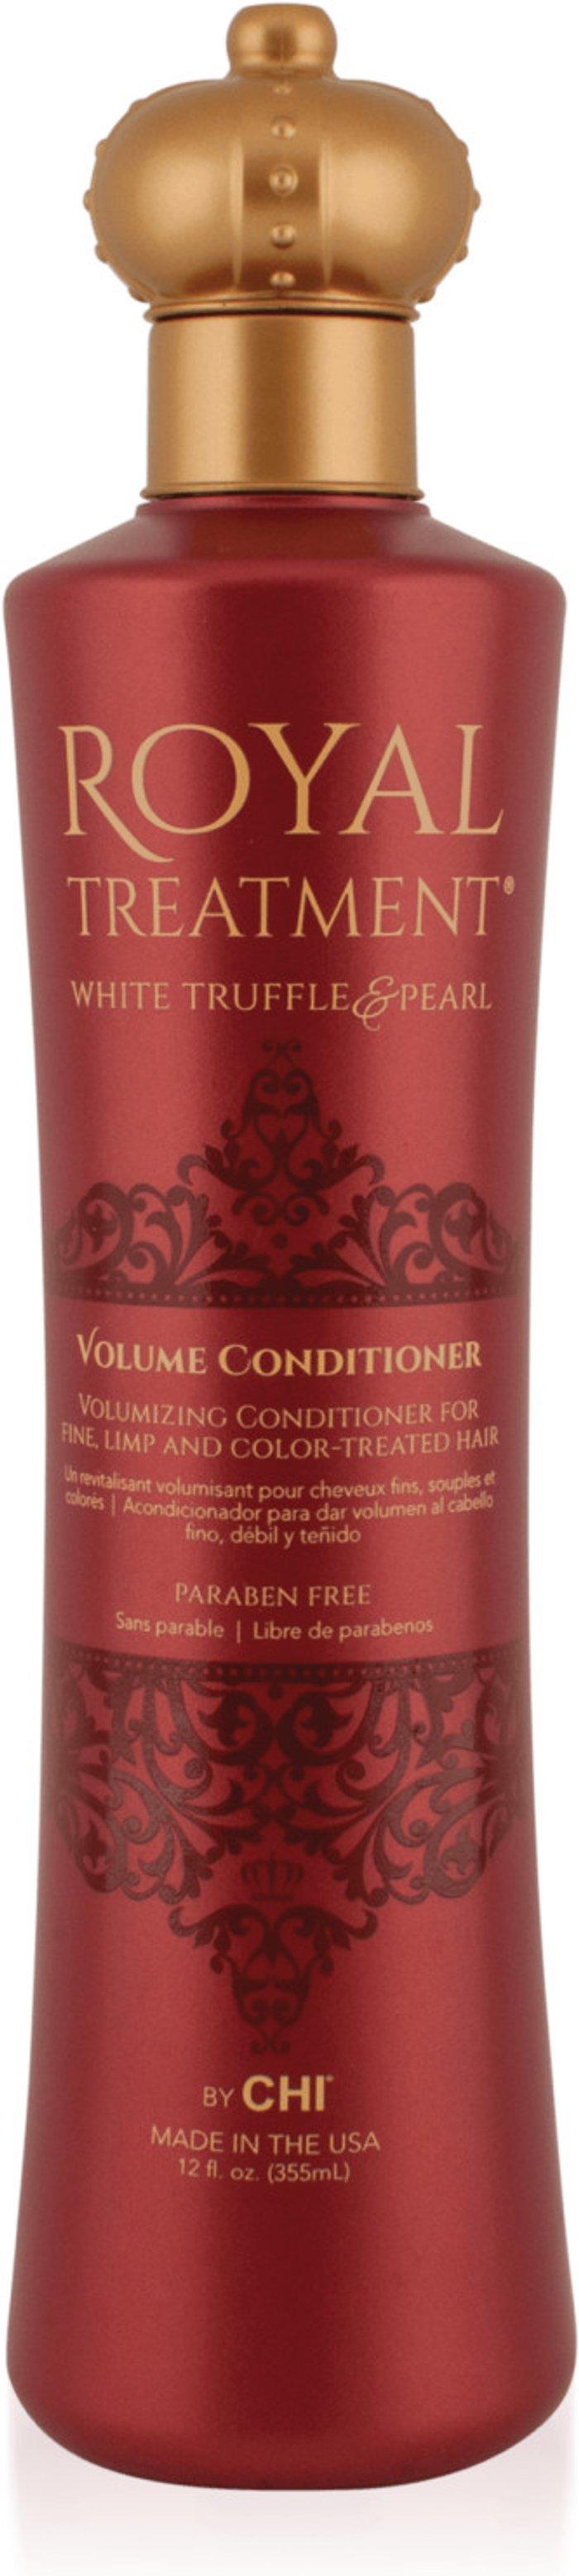 CHI CHI Farouk Royal Treatment Volume Conditioner (355ml)